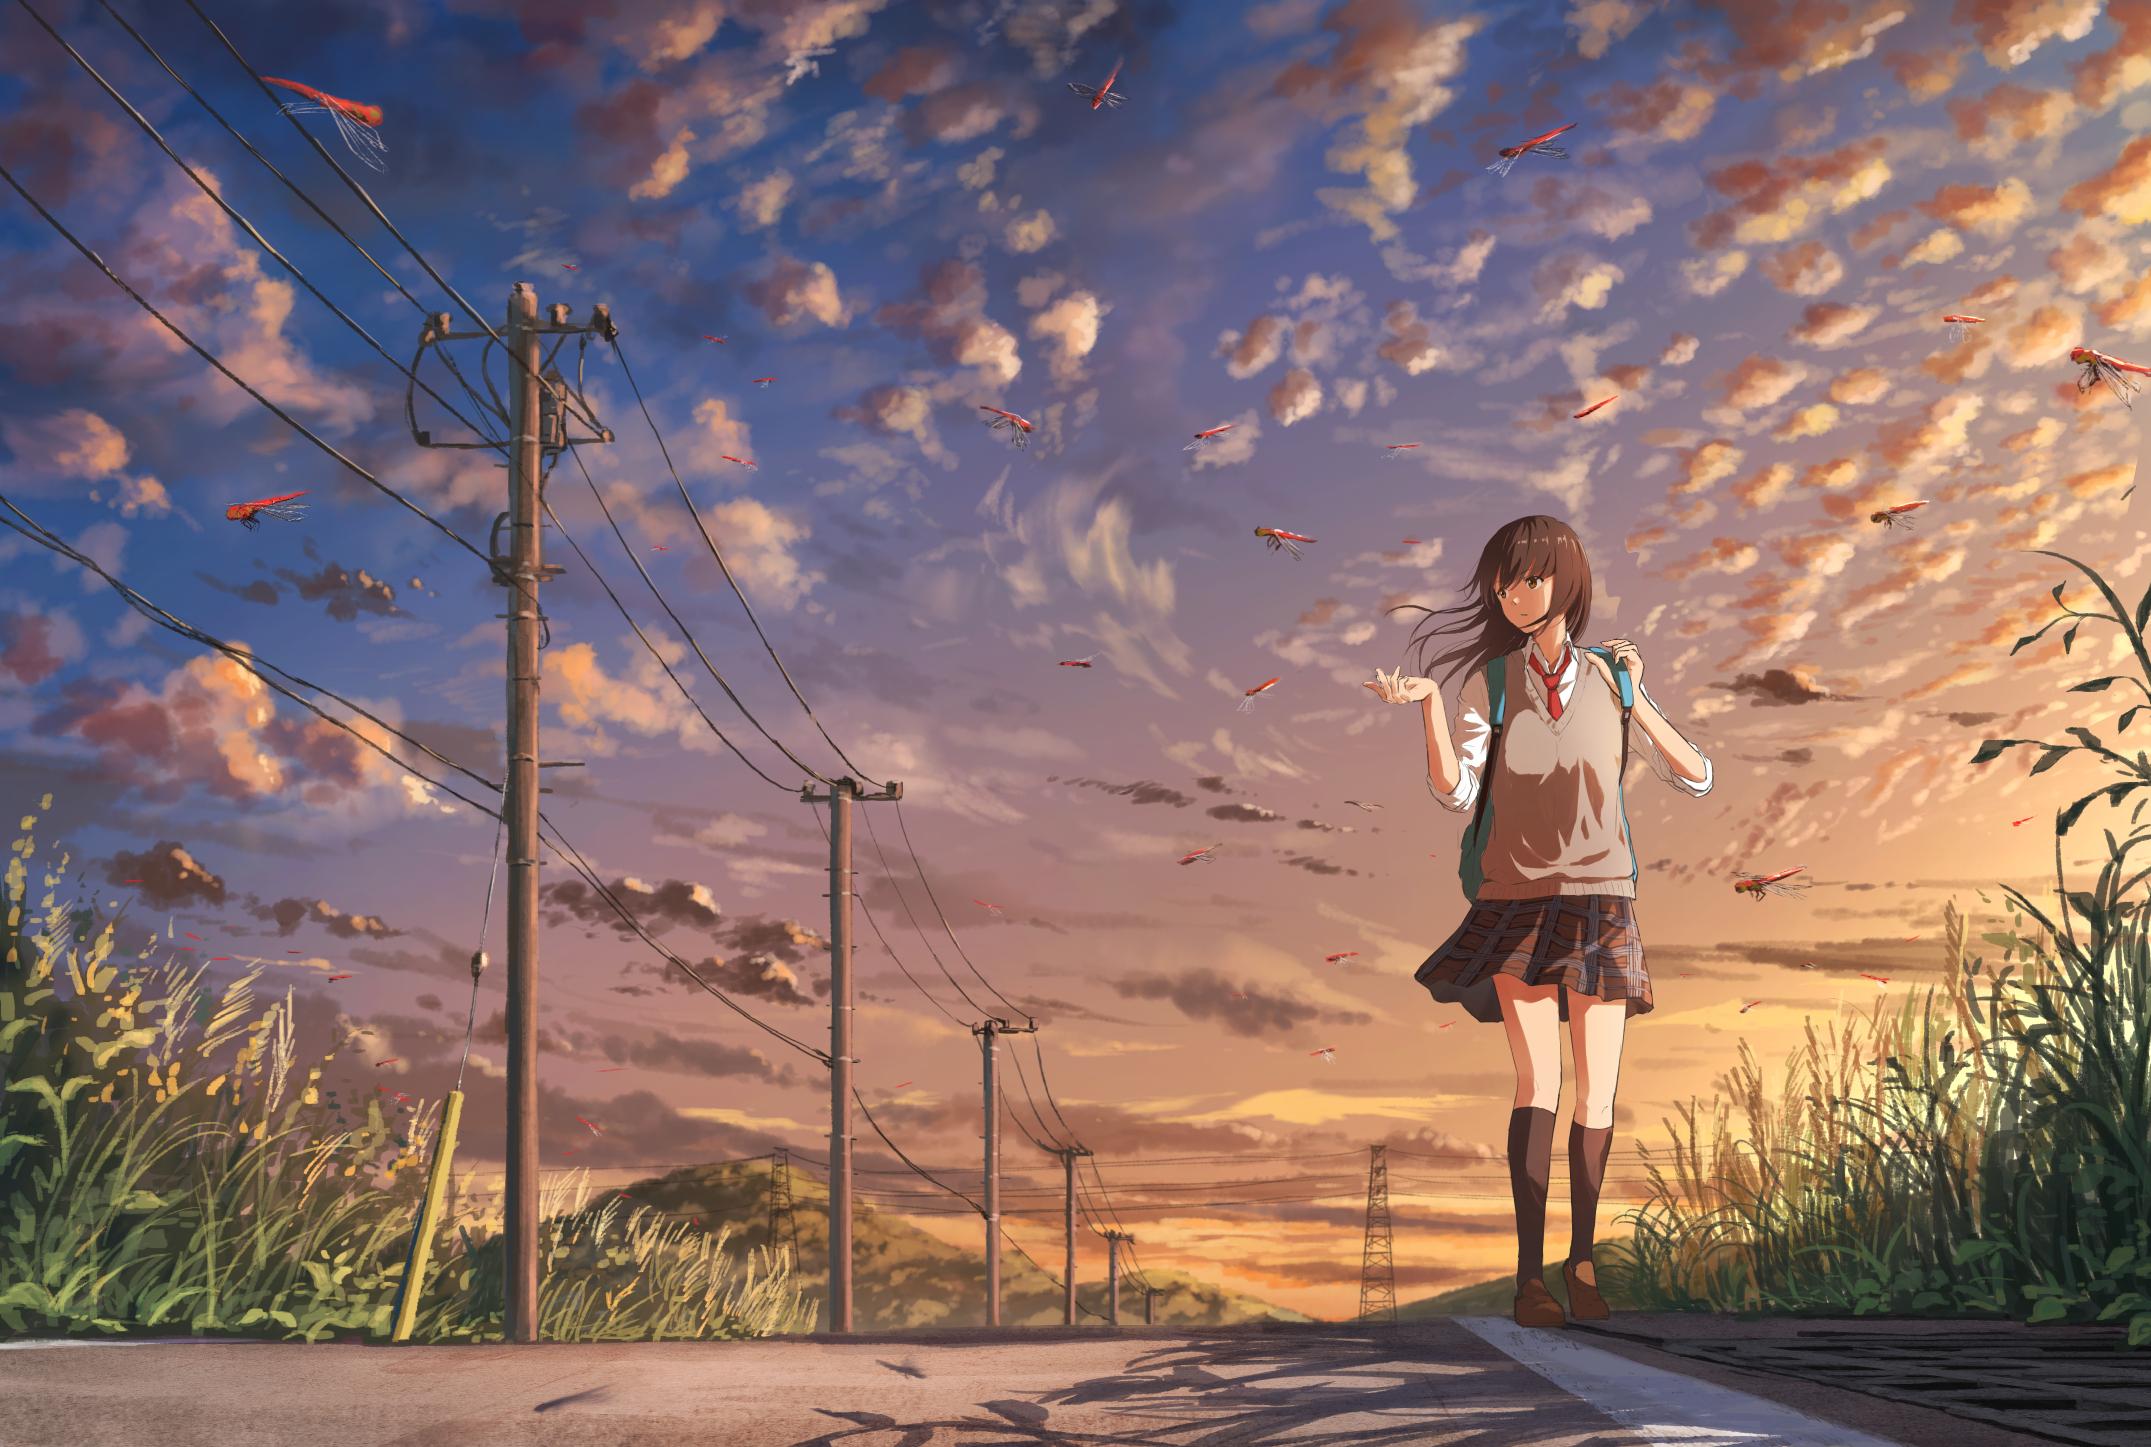 1080x1920 Anime Girl Going To School Iphone 7,6s,6 Plus